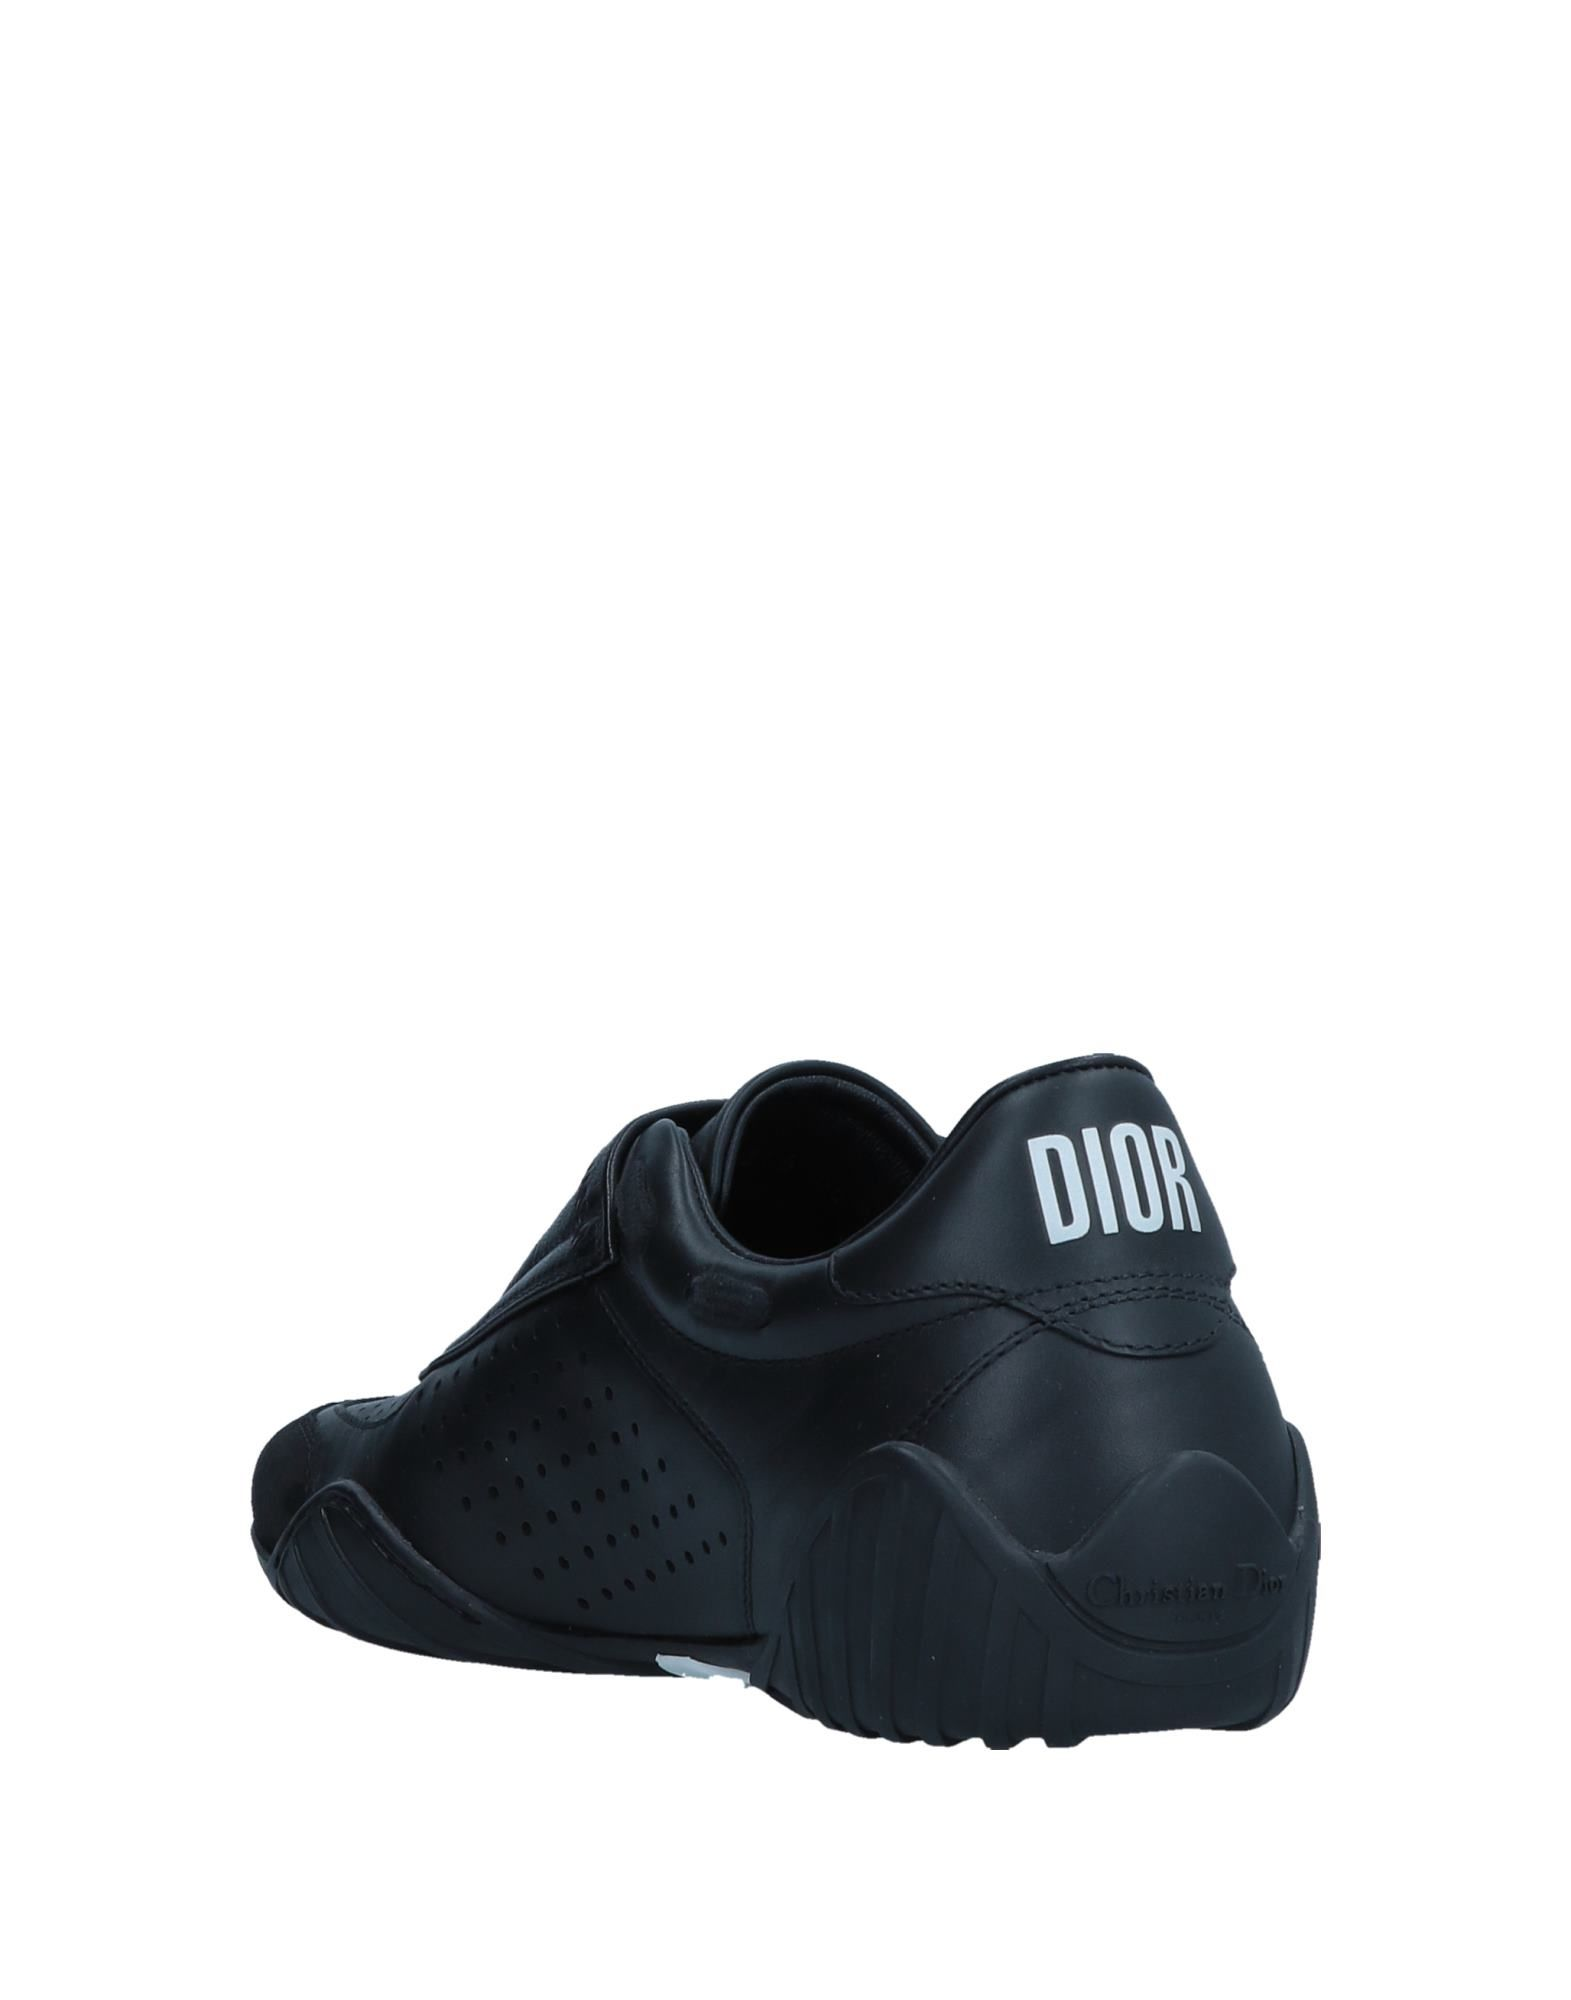 Dior Sneakers Damen Schuhe  11547841TLGünstige gut aussehende Schuhe Damen b40051